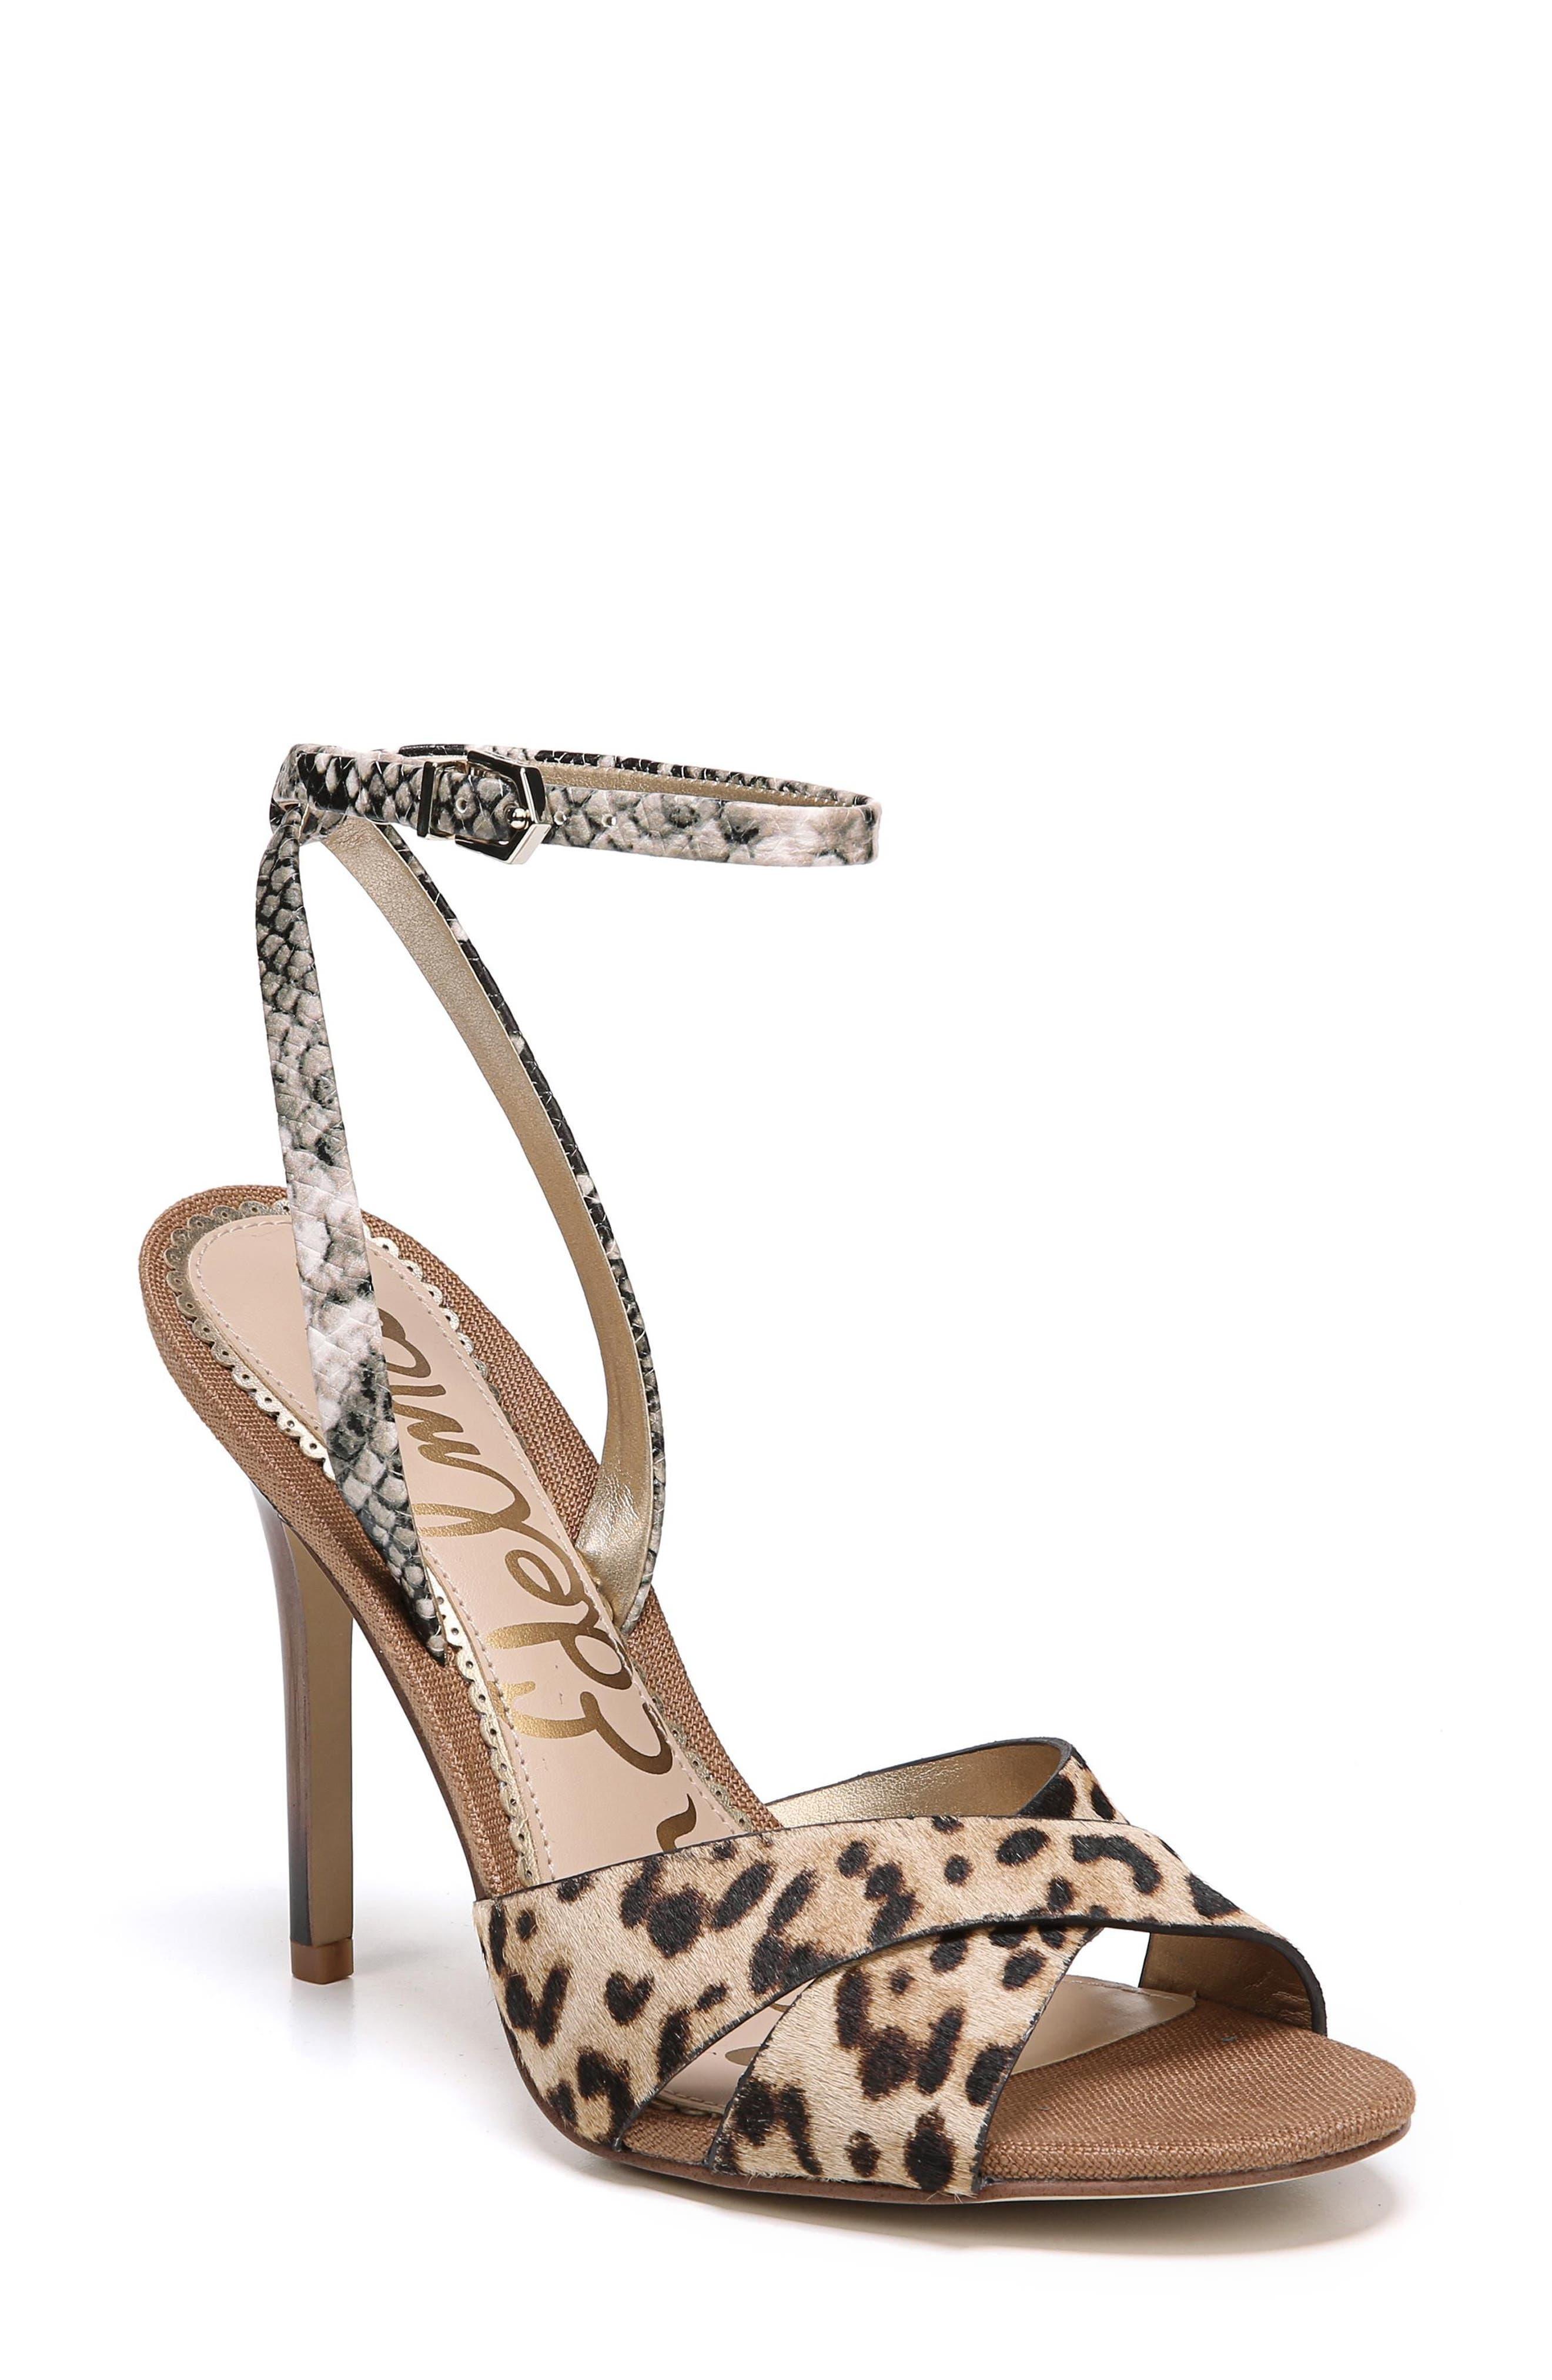 Aly Ankle Strap Sandal,                         Main,                         color, Leopard Print Calf Hair